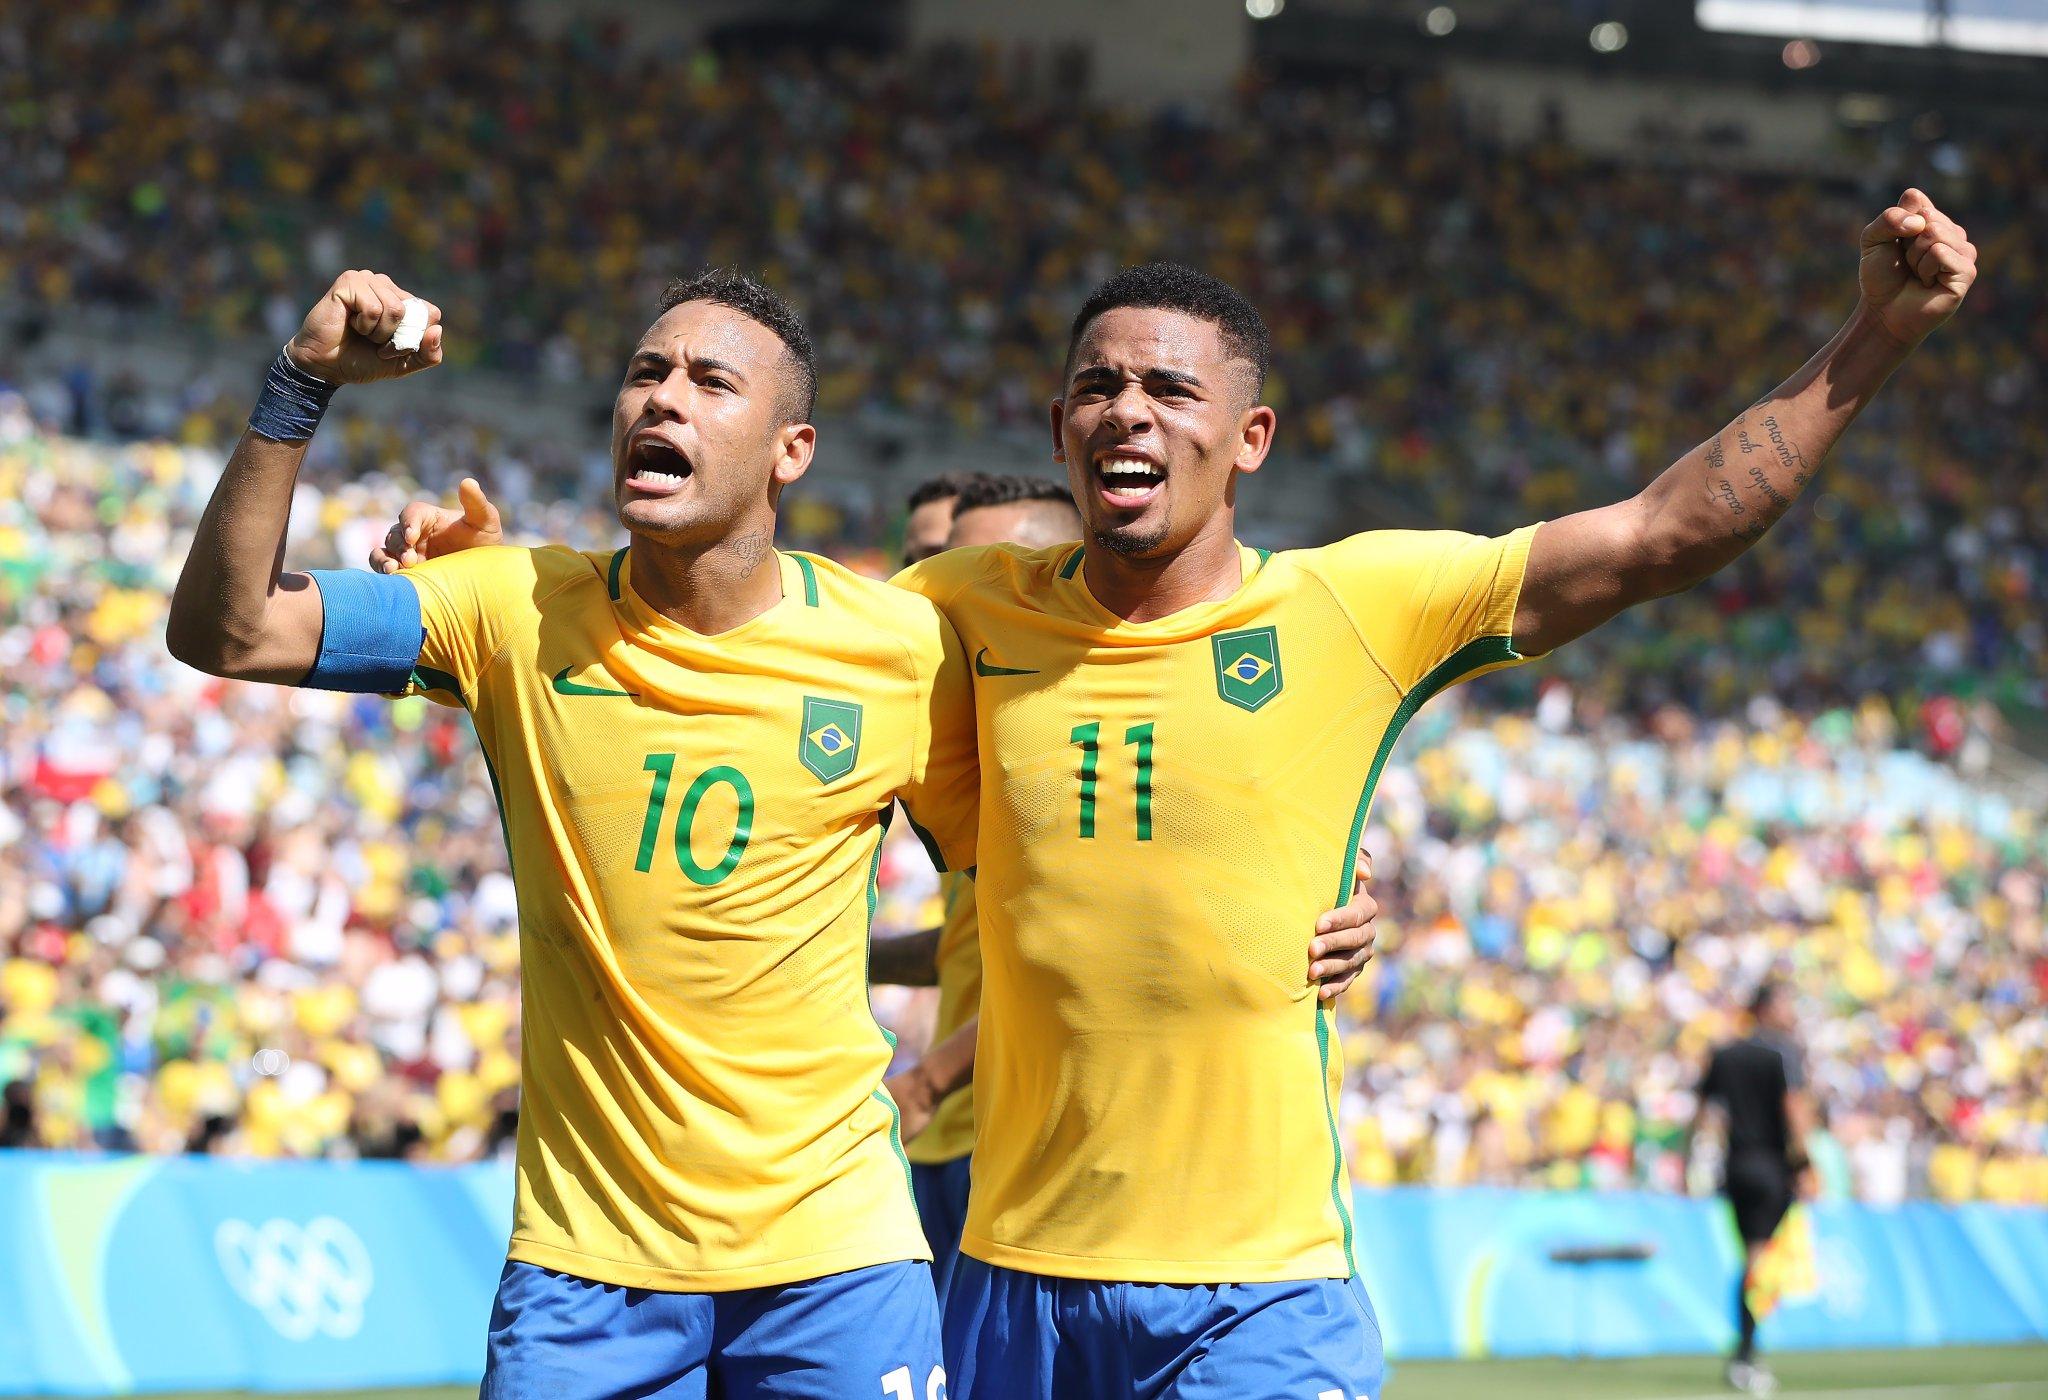 Neymar Scores As Brazil Crush Honduras, Qualify For Fourth Olympic Final